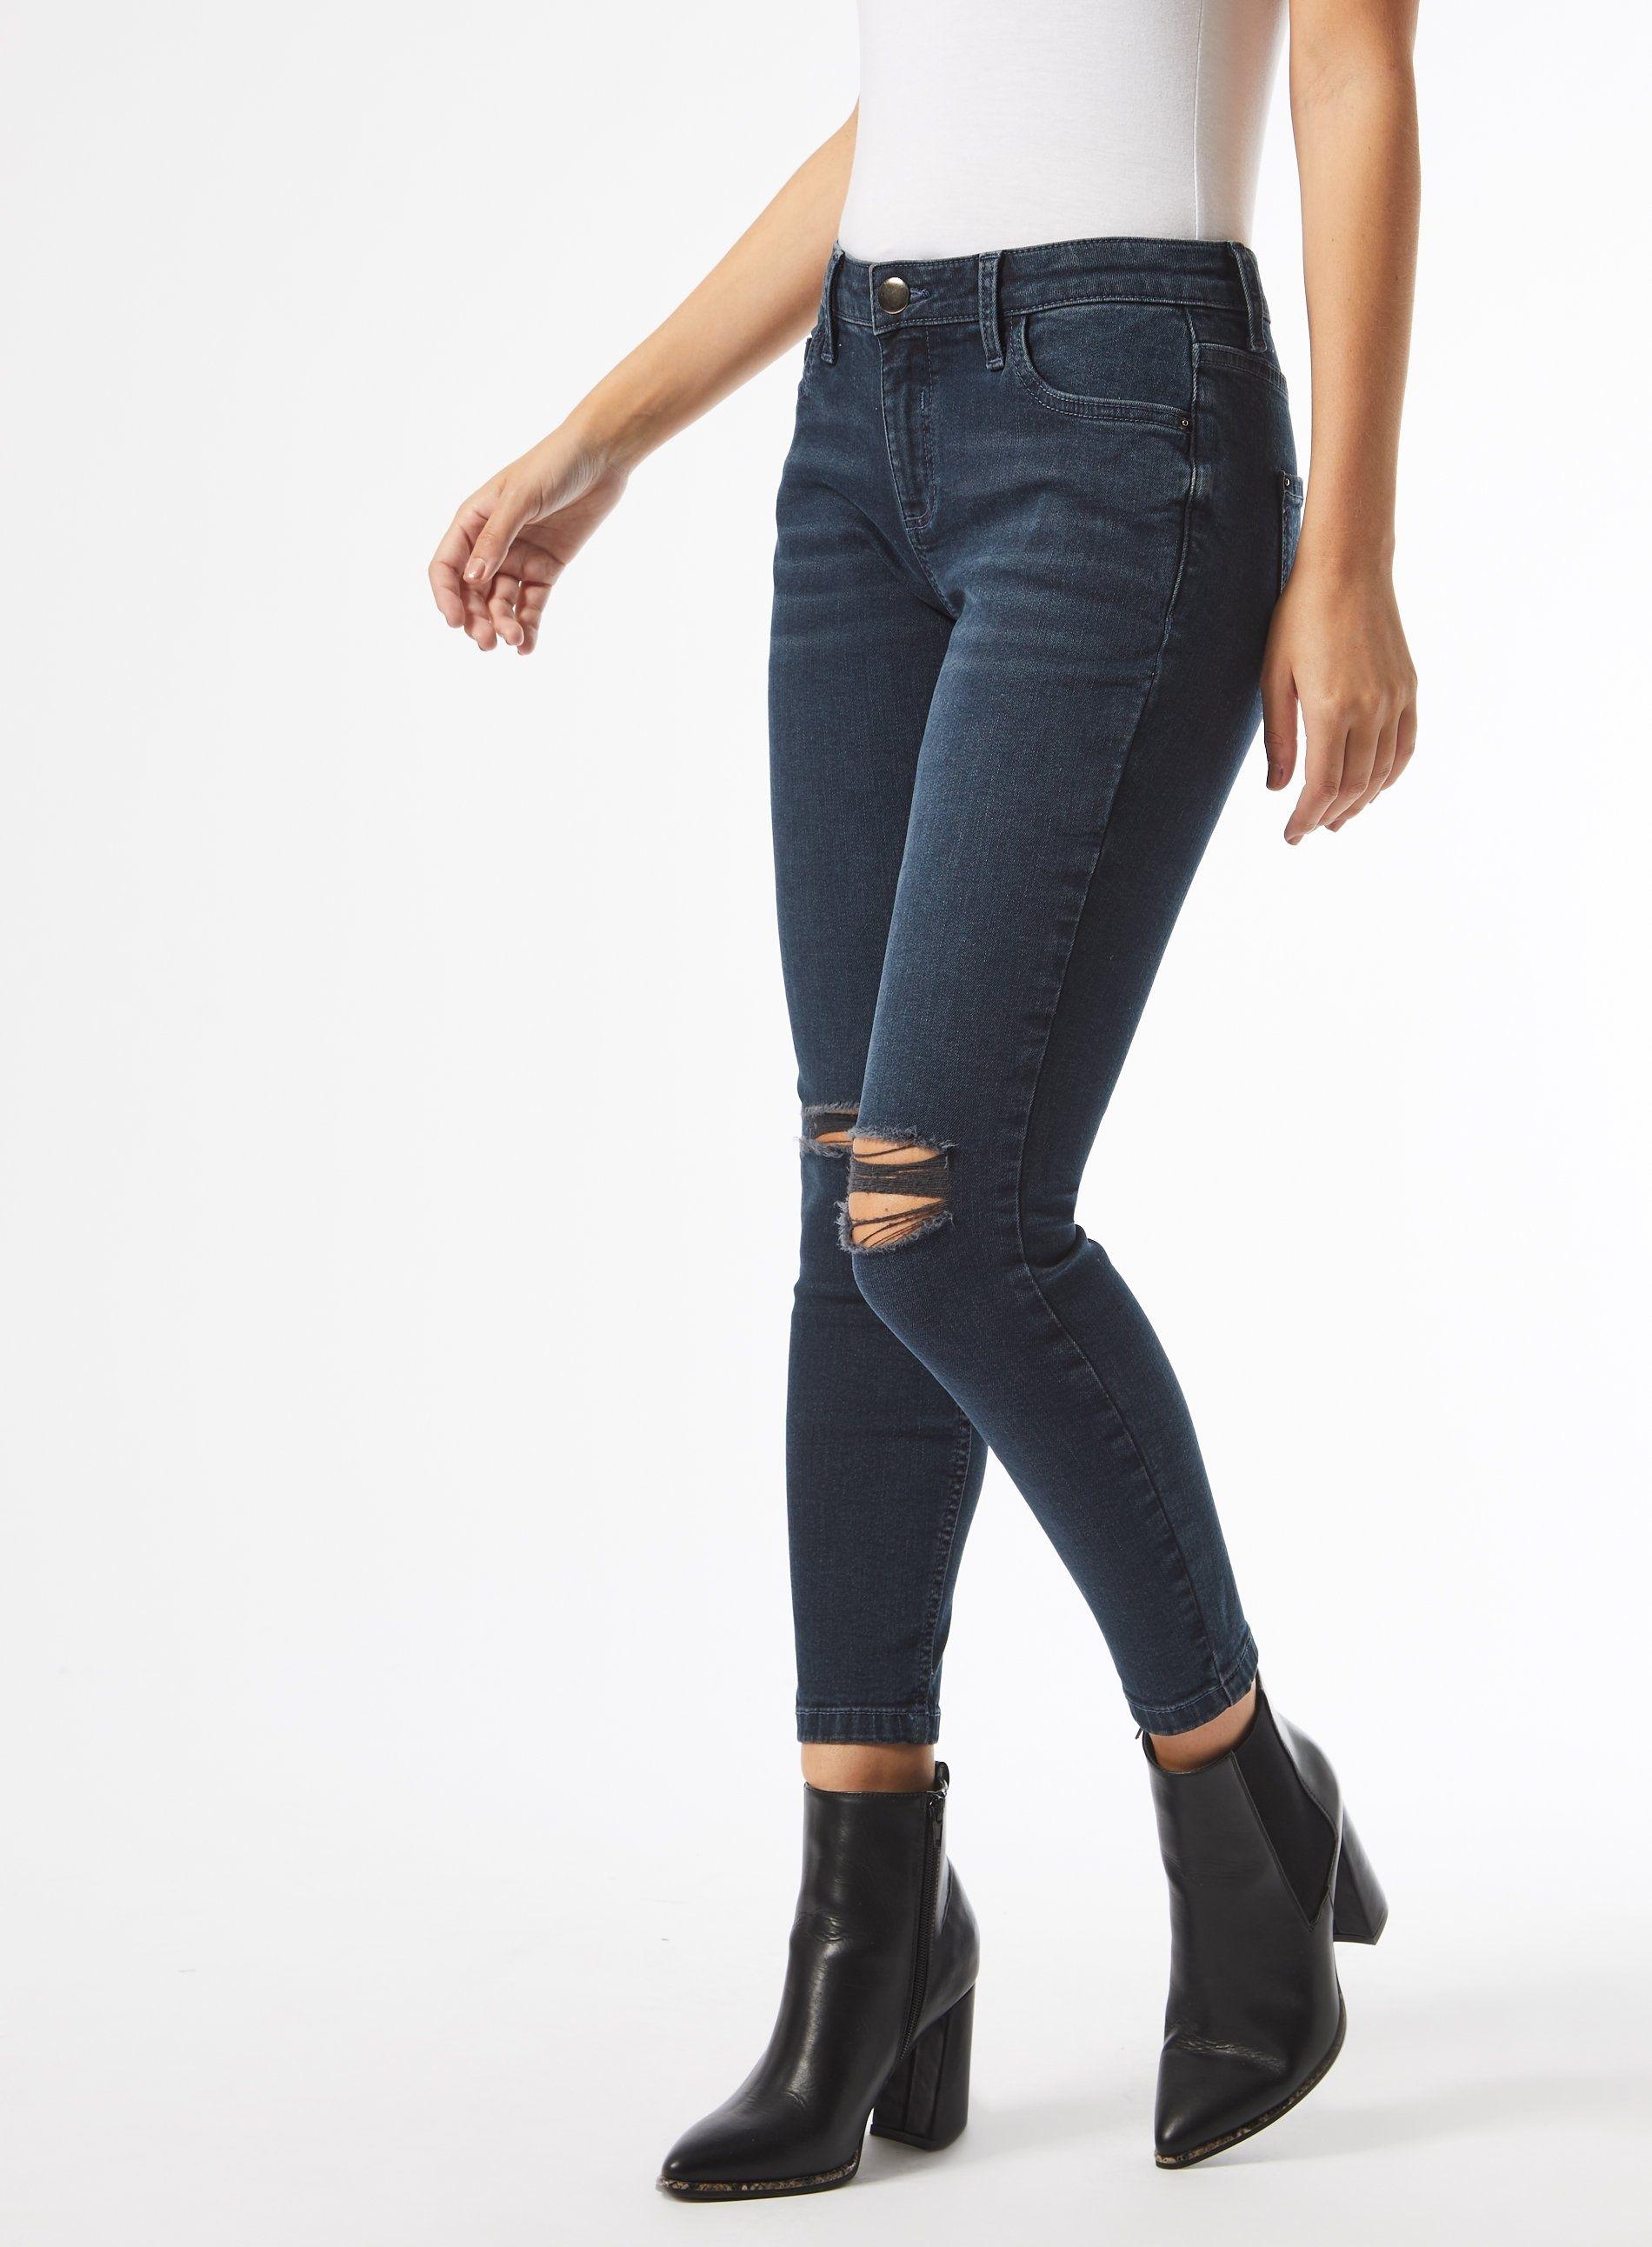 Dorothy Perkins Womens Petite Blue Rip Darcy Jeans Denim Pants Bottoms Trousers